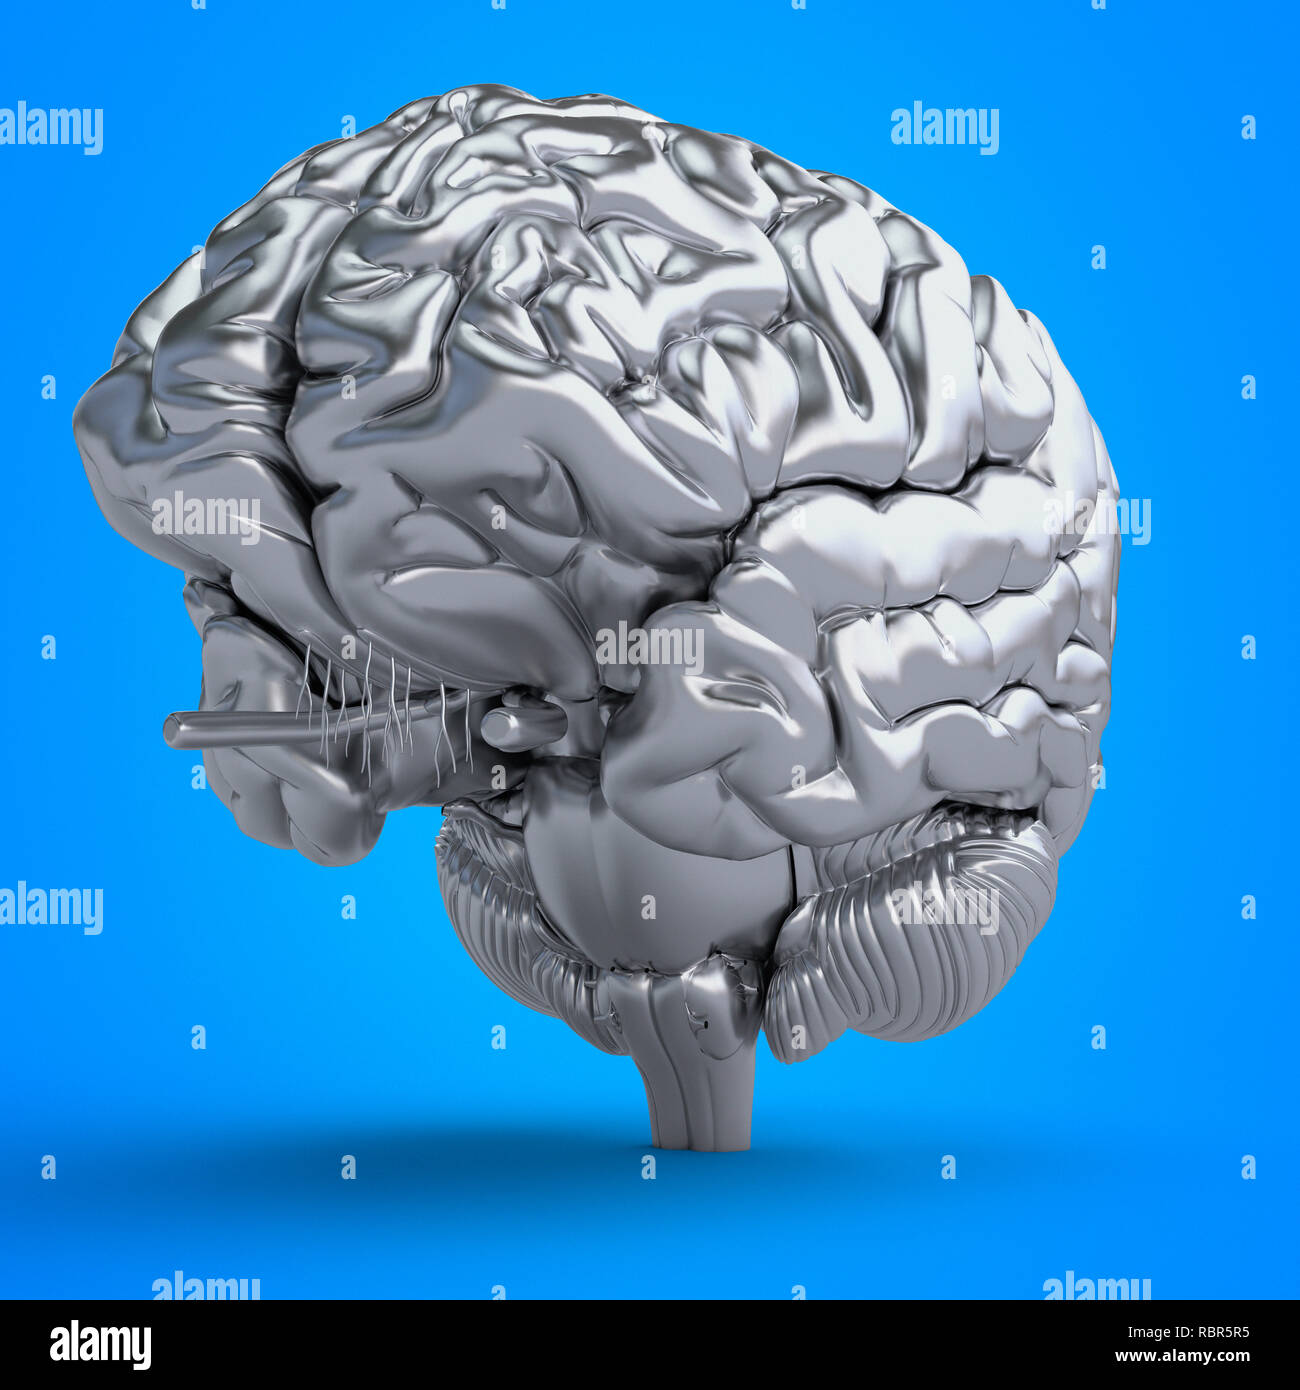 Illustration of a brain. - Stock Image